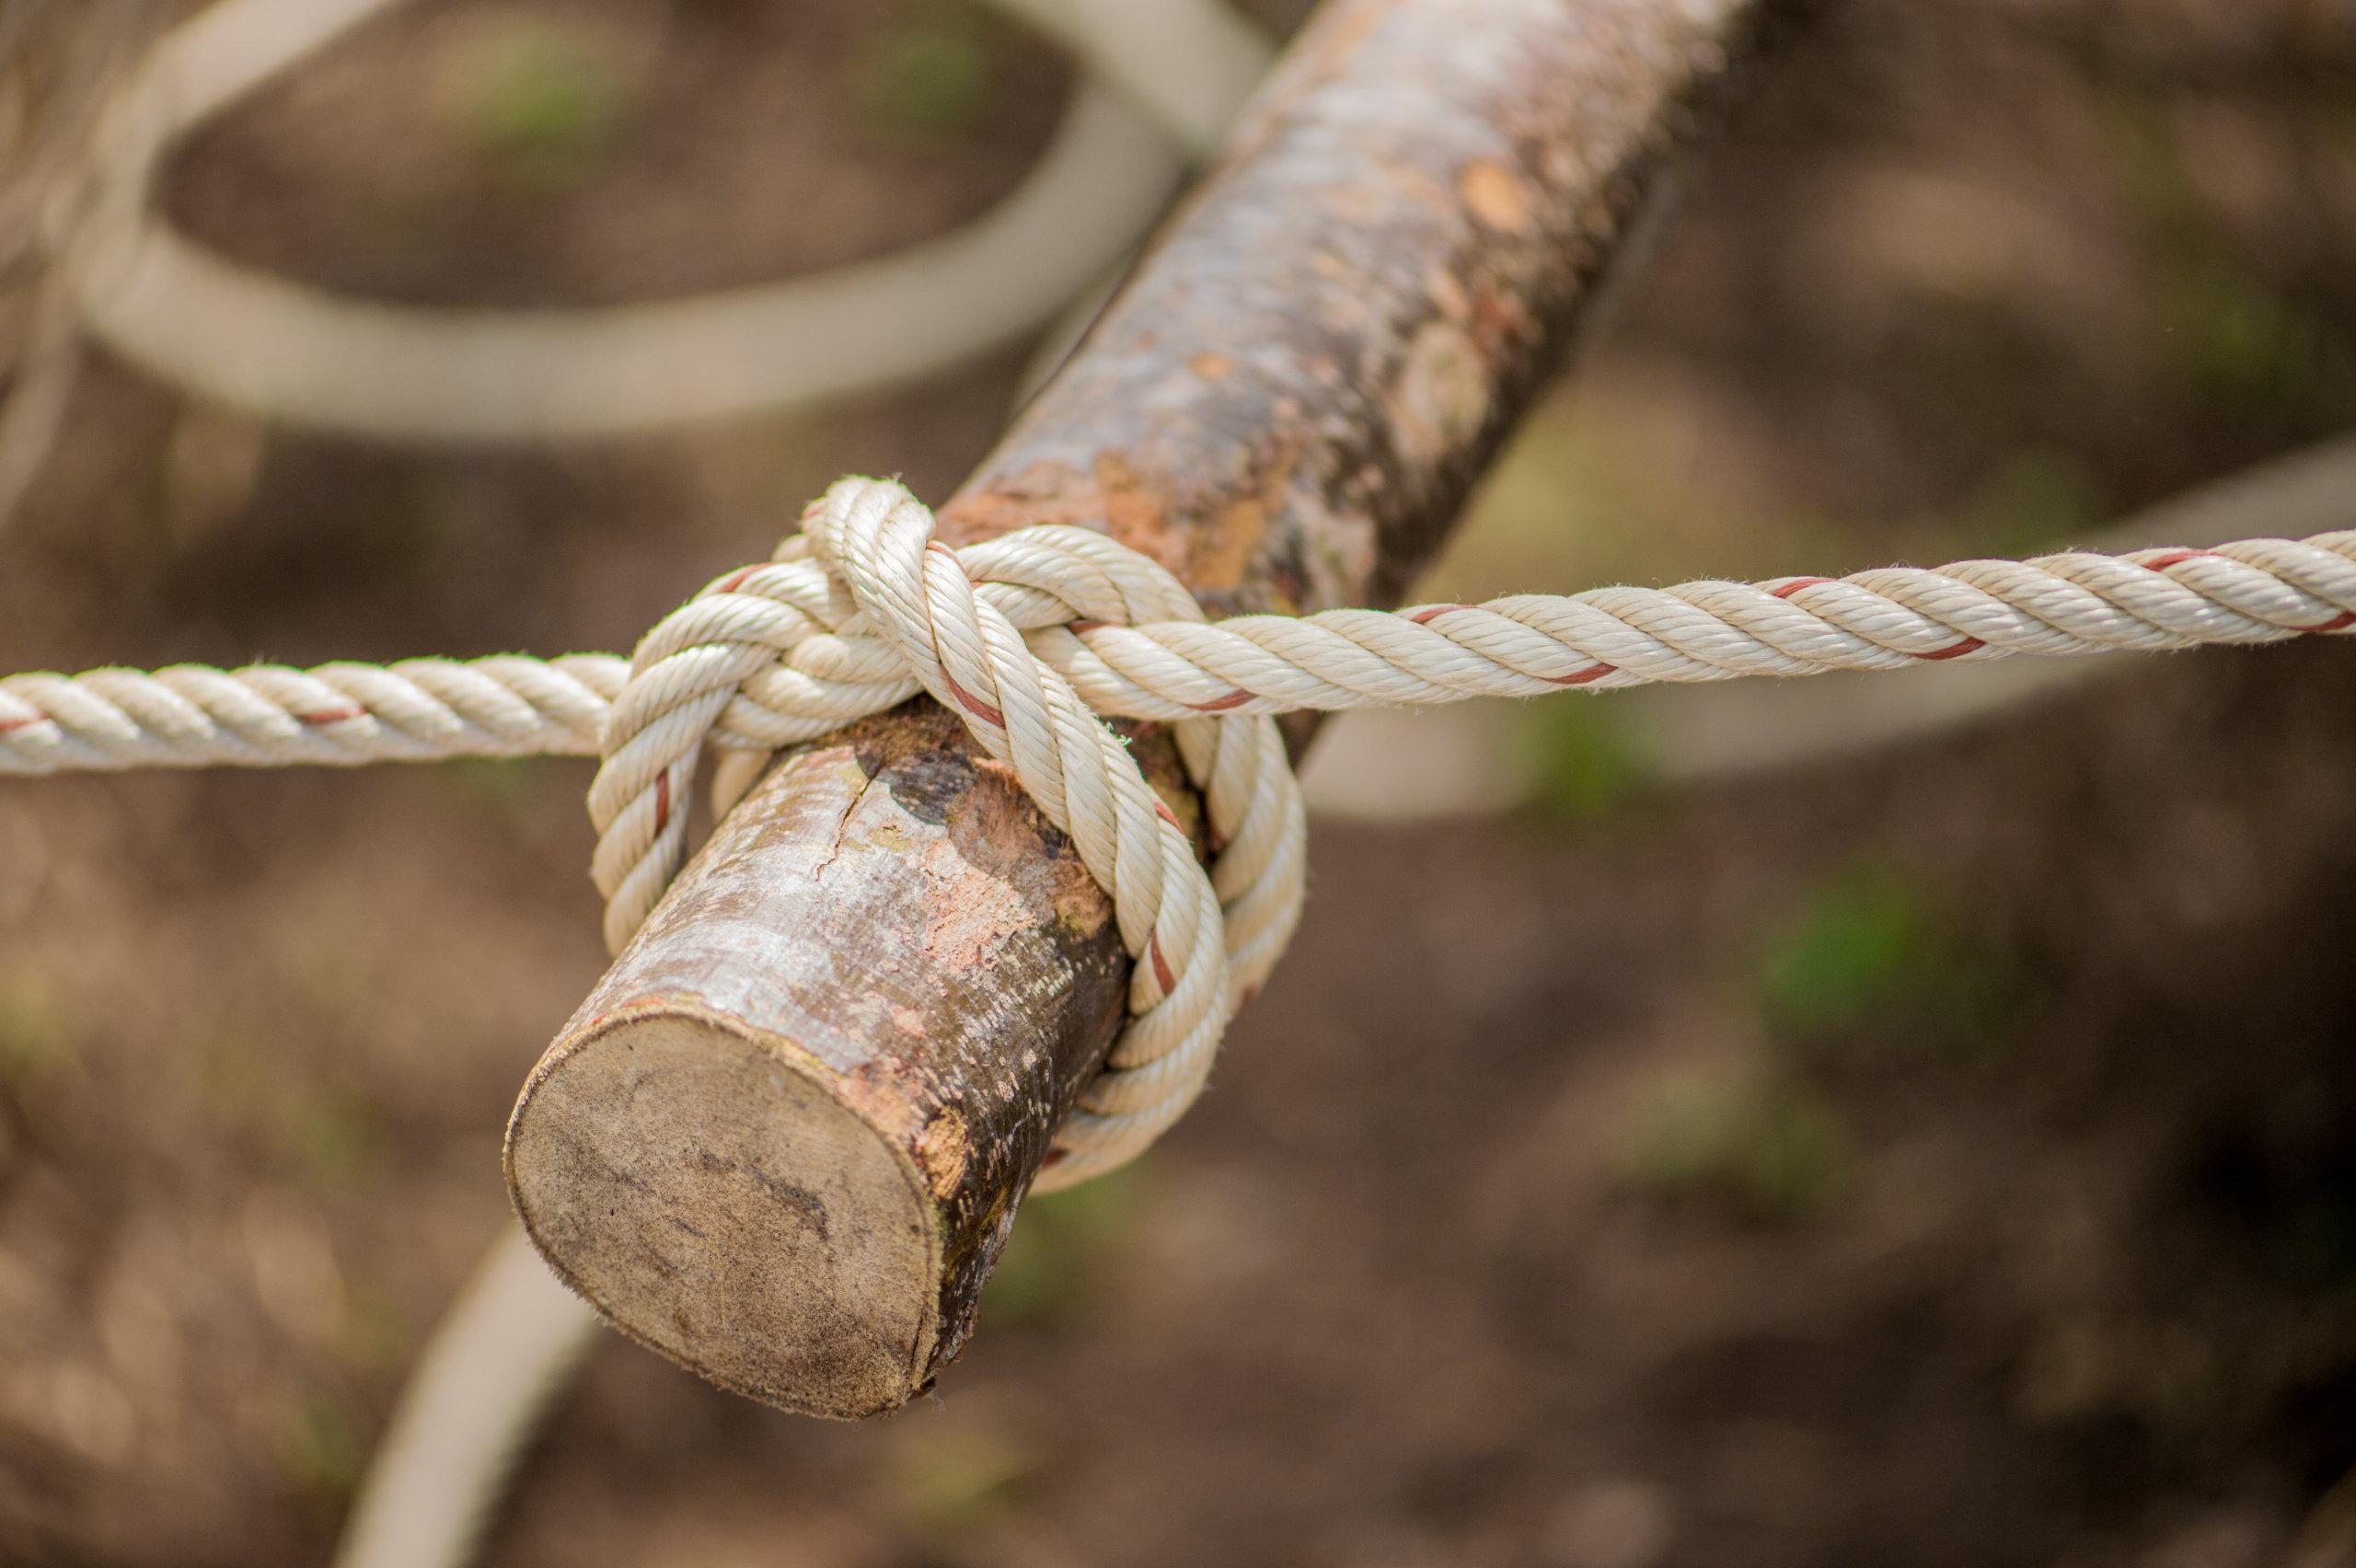 Ropes & Knots workshop